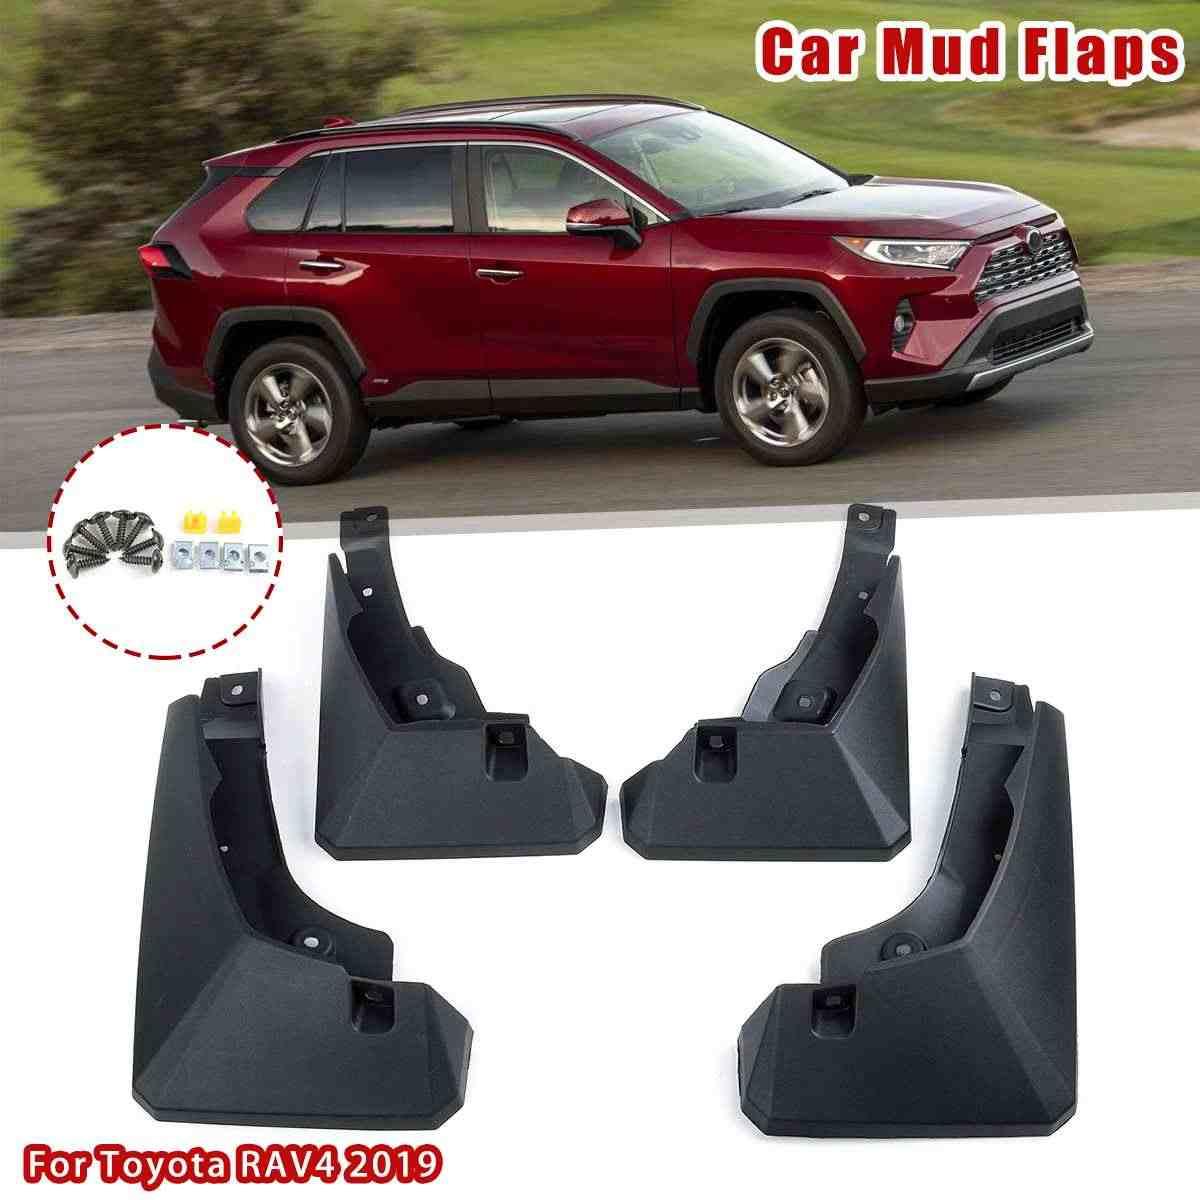 Huadi RAV4 Car Mudflaps Front Rear (4 Pack)Mud Guards For RAV4 RAV4 XA50 2019 2020 Car Accessories(Black)